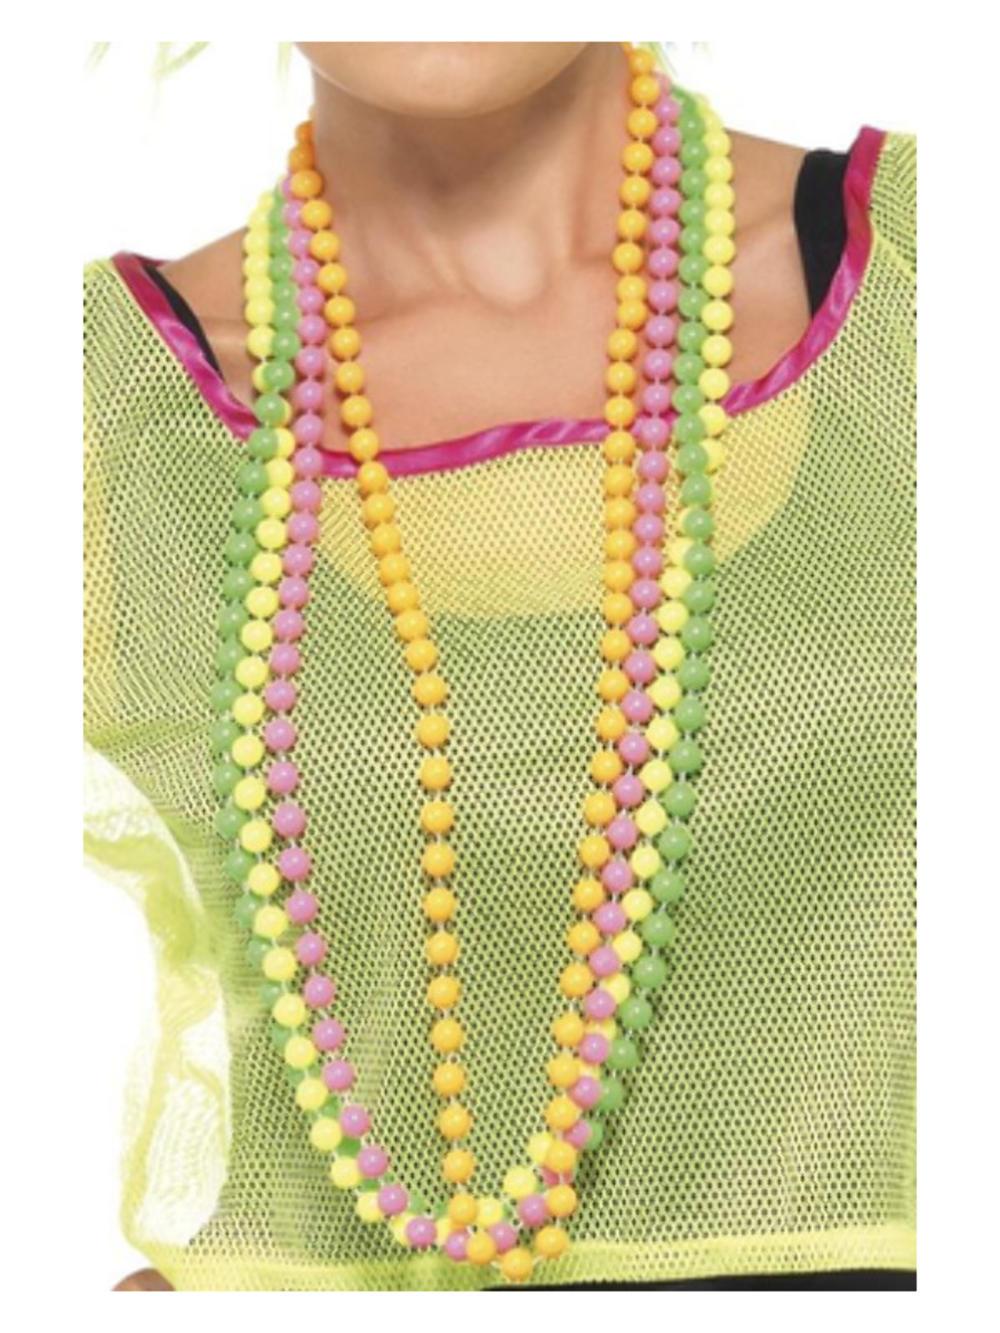 Fluorescent Bead Necklace